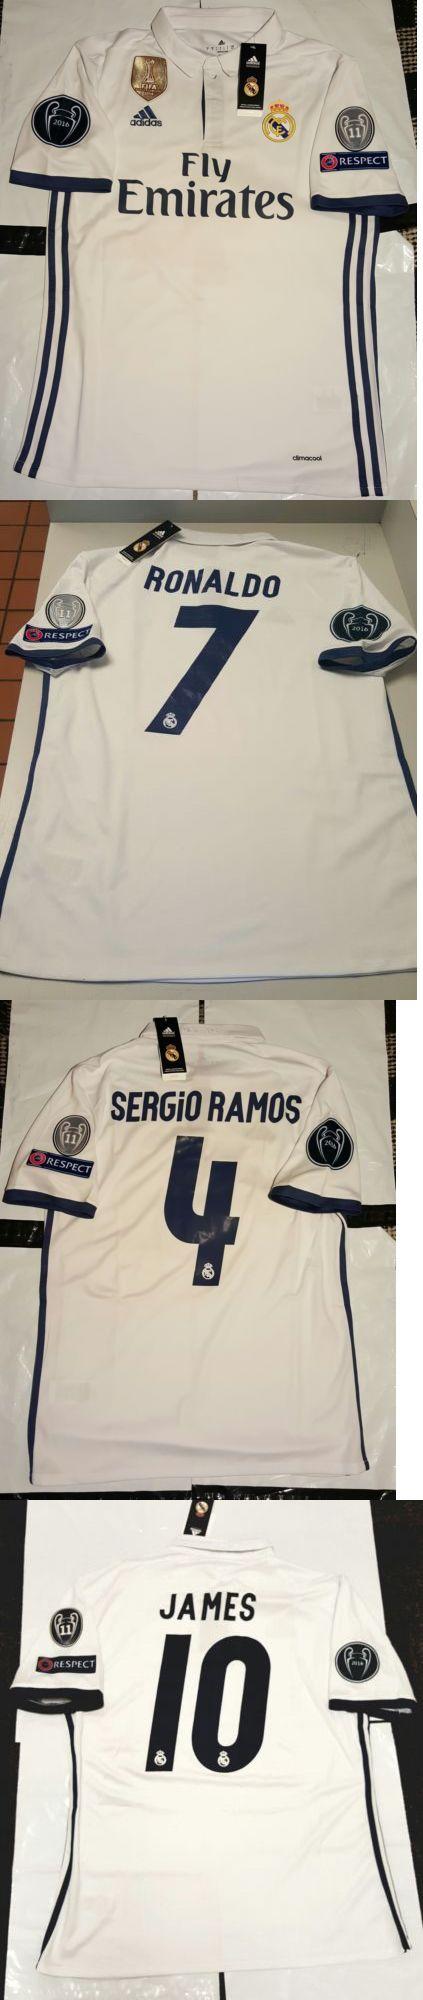 Men 123490: 2017 Real Madrid Soccer Jersey Camisa De Futbol De Real Madrid -> BUY IT NOW ONLY: $64.5 on eBay!